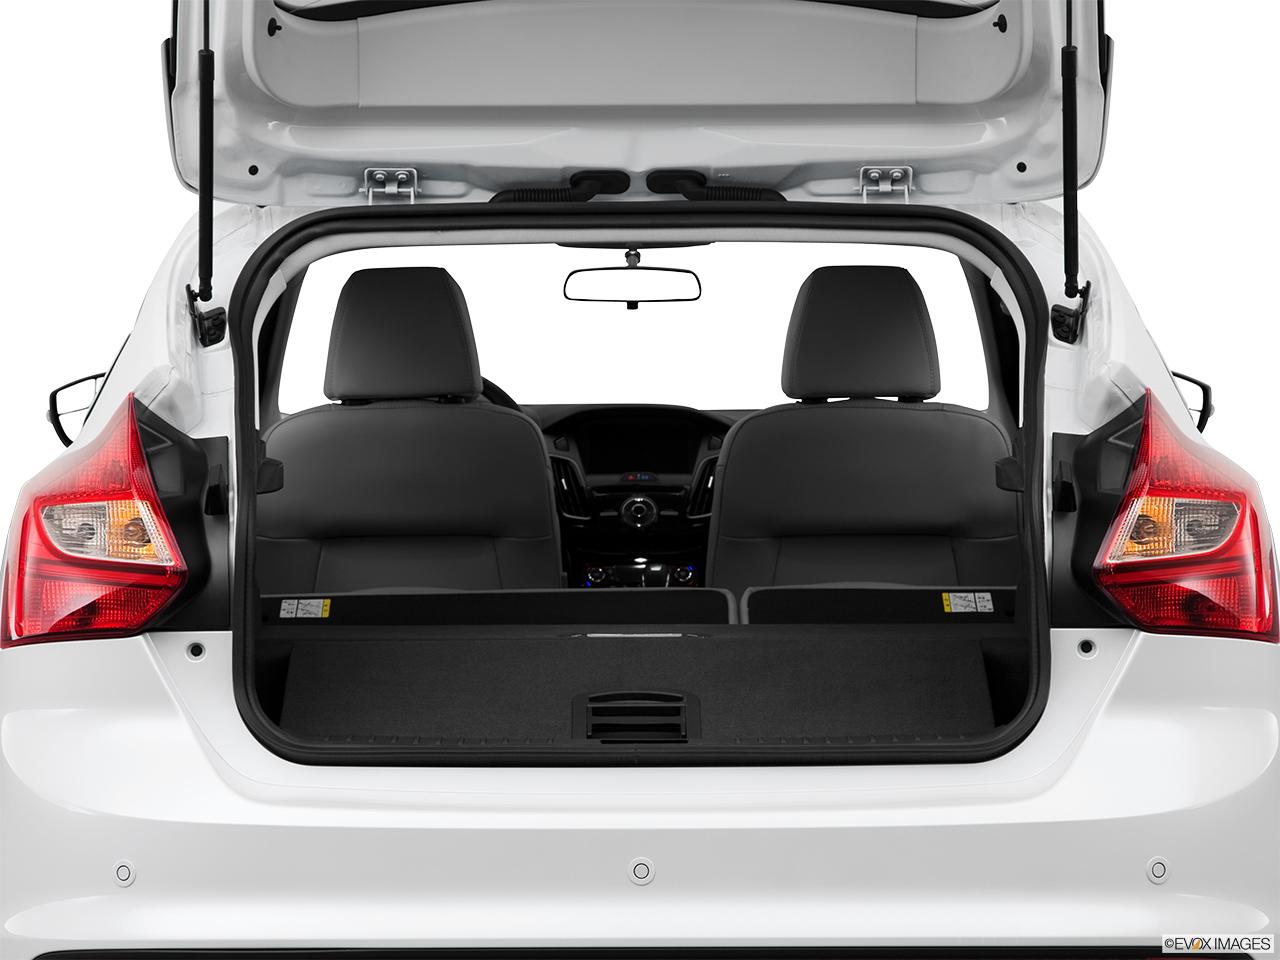 Ford Suv Cars >> 2014 Ford Focus Electric 5dr Hatchback - Hatchback & SUV rear angle